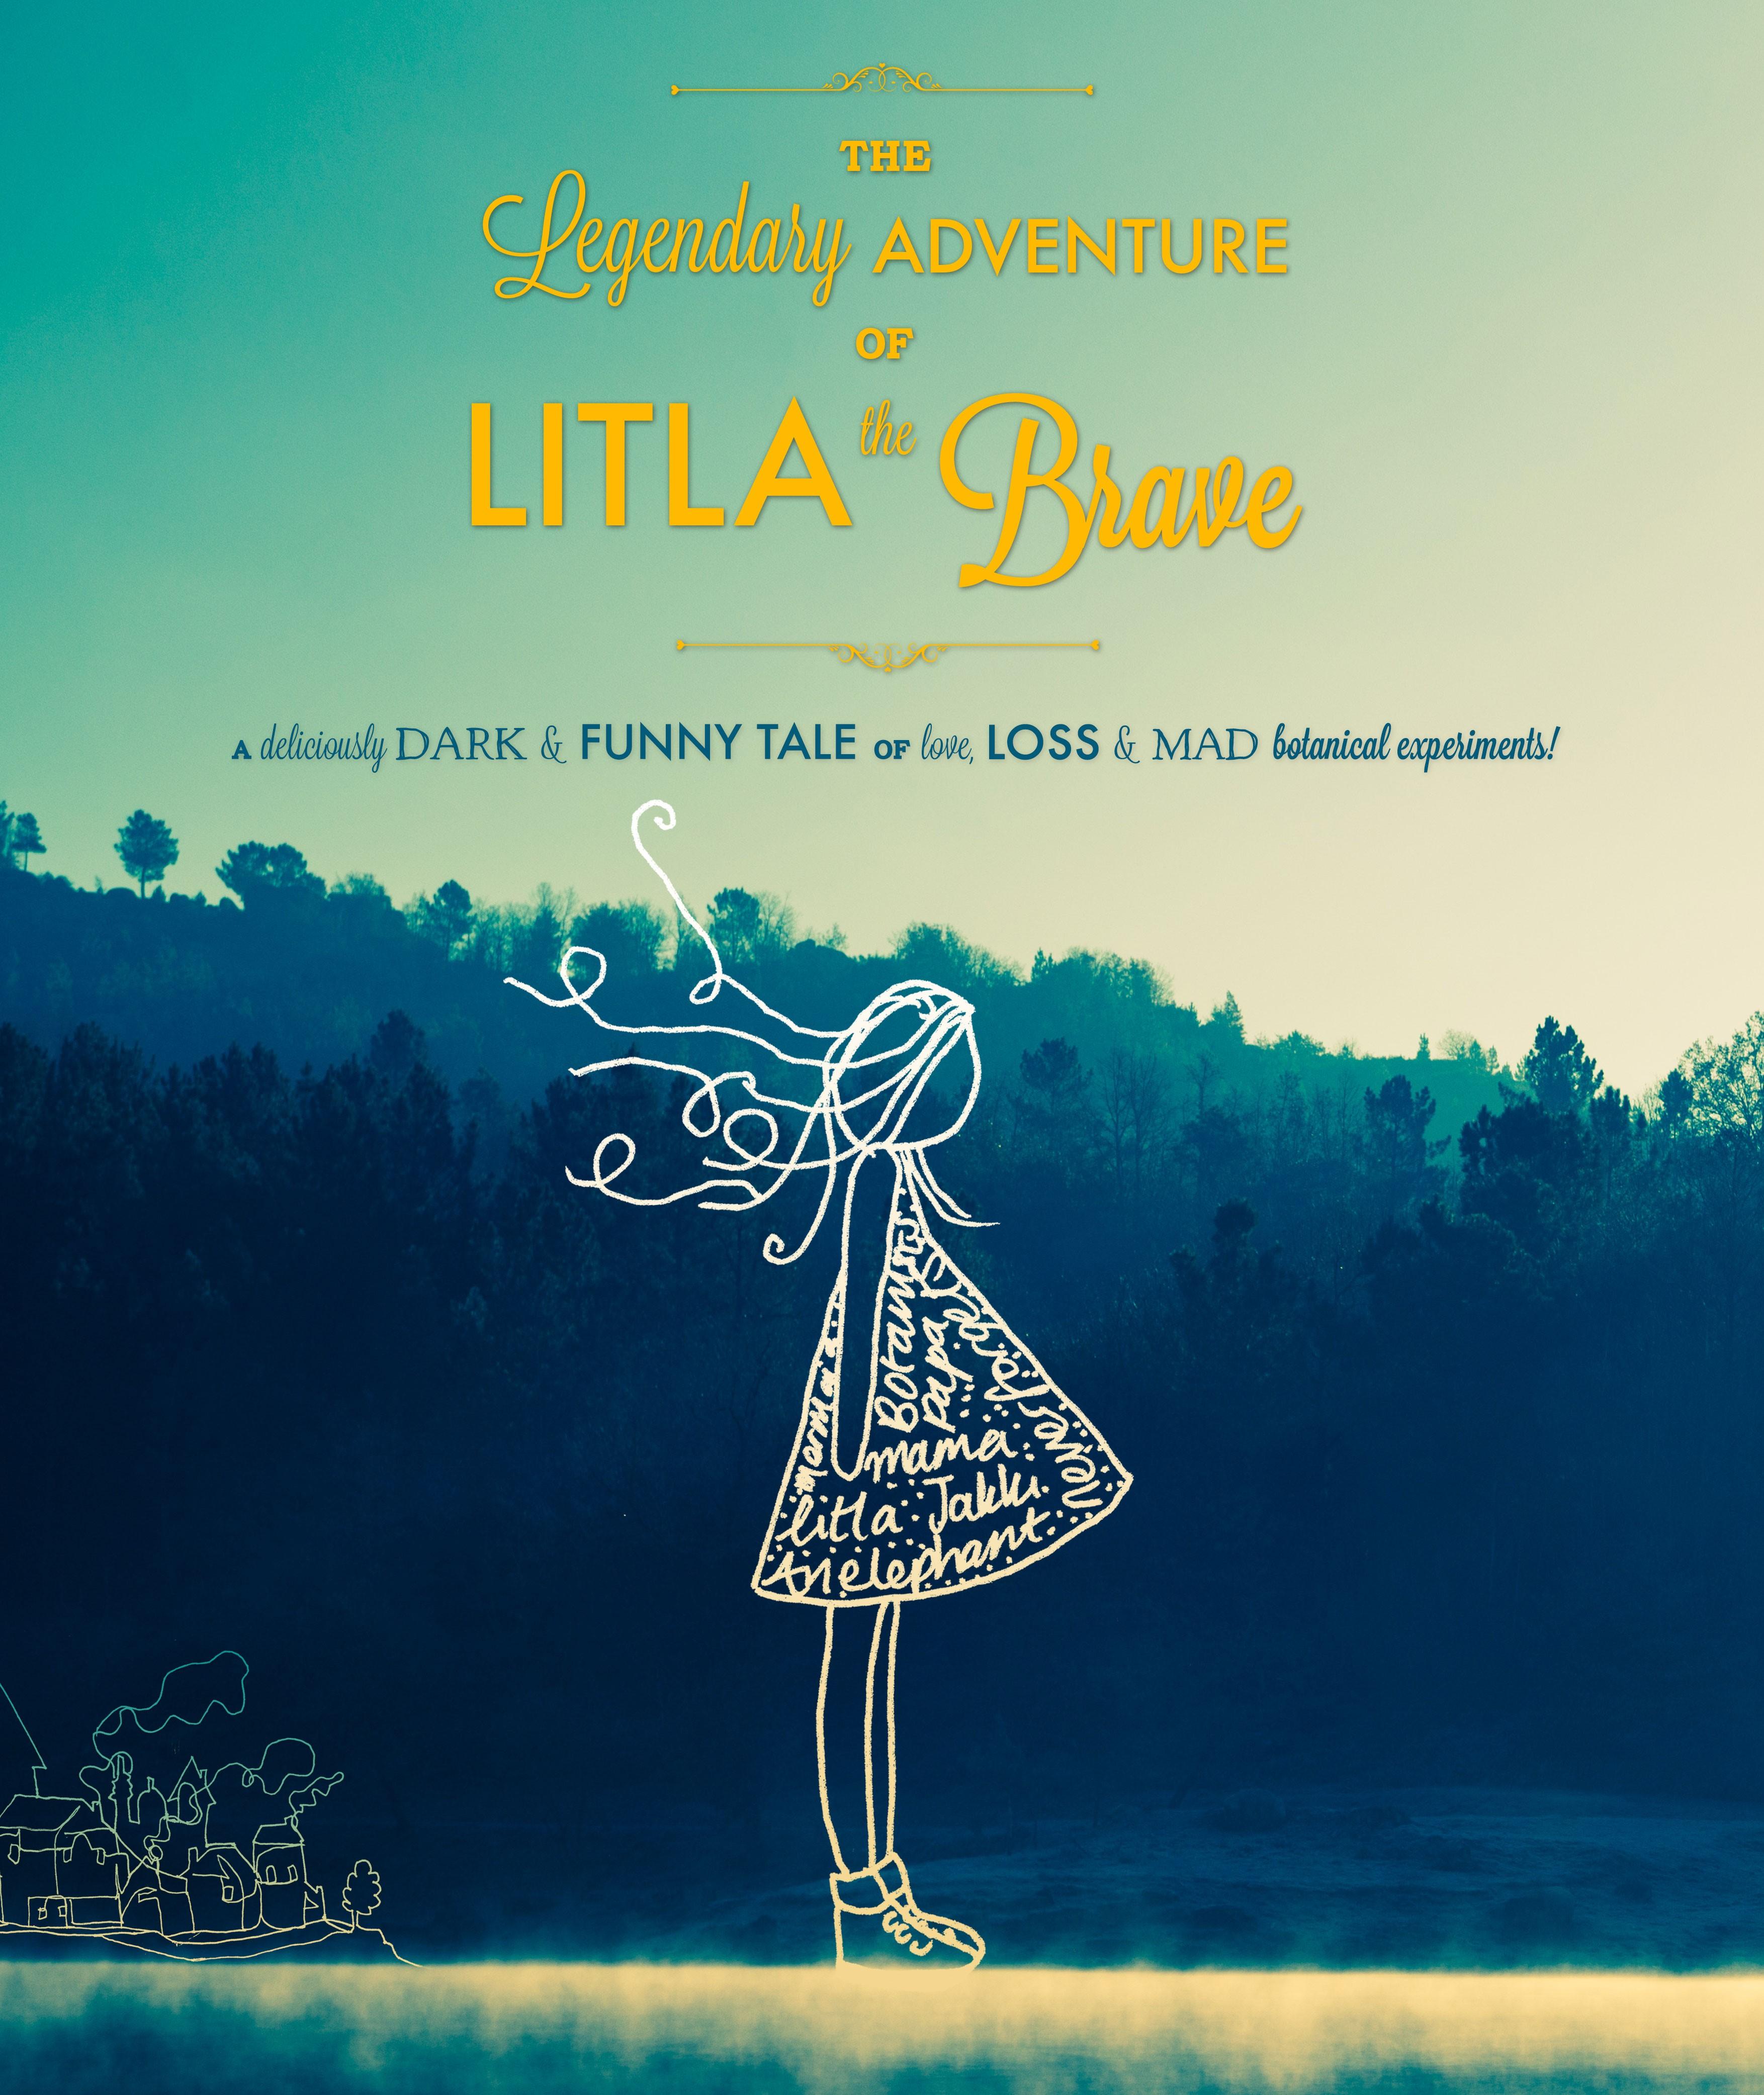 Litla-Poster (3) (2)